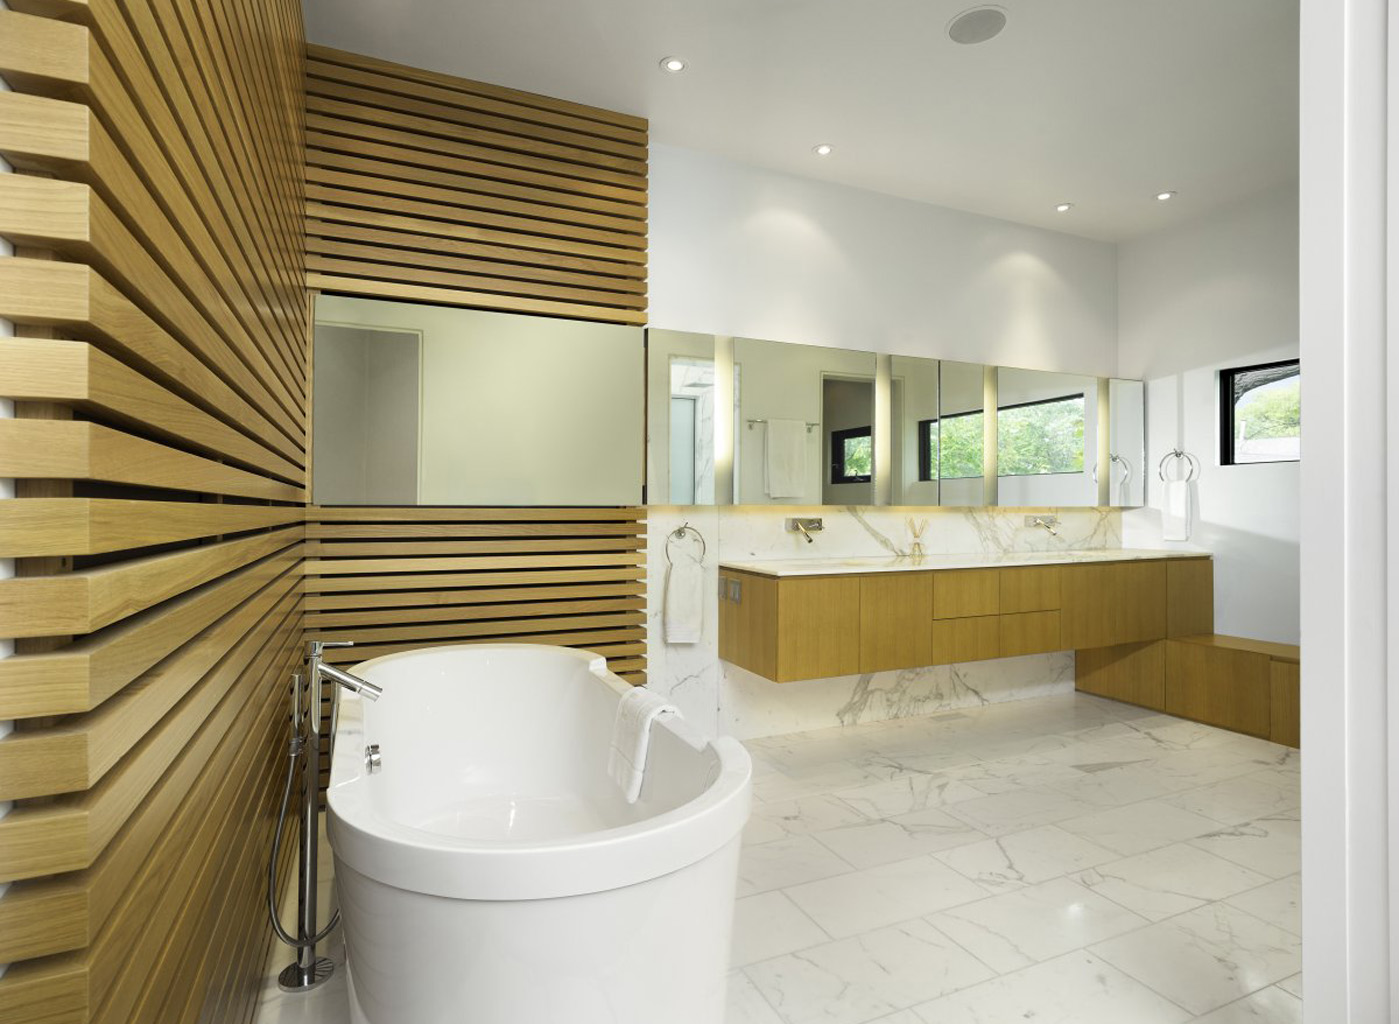 agencement salles de bains artisan Savenay 44